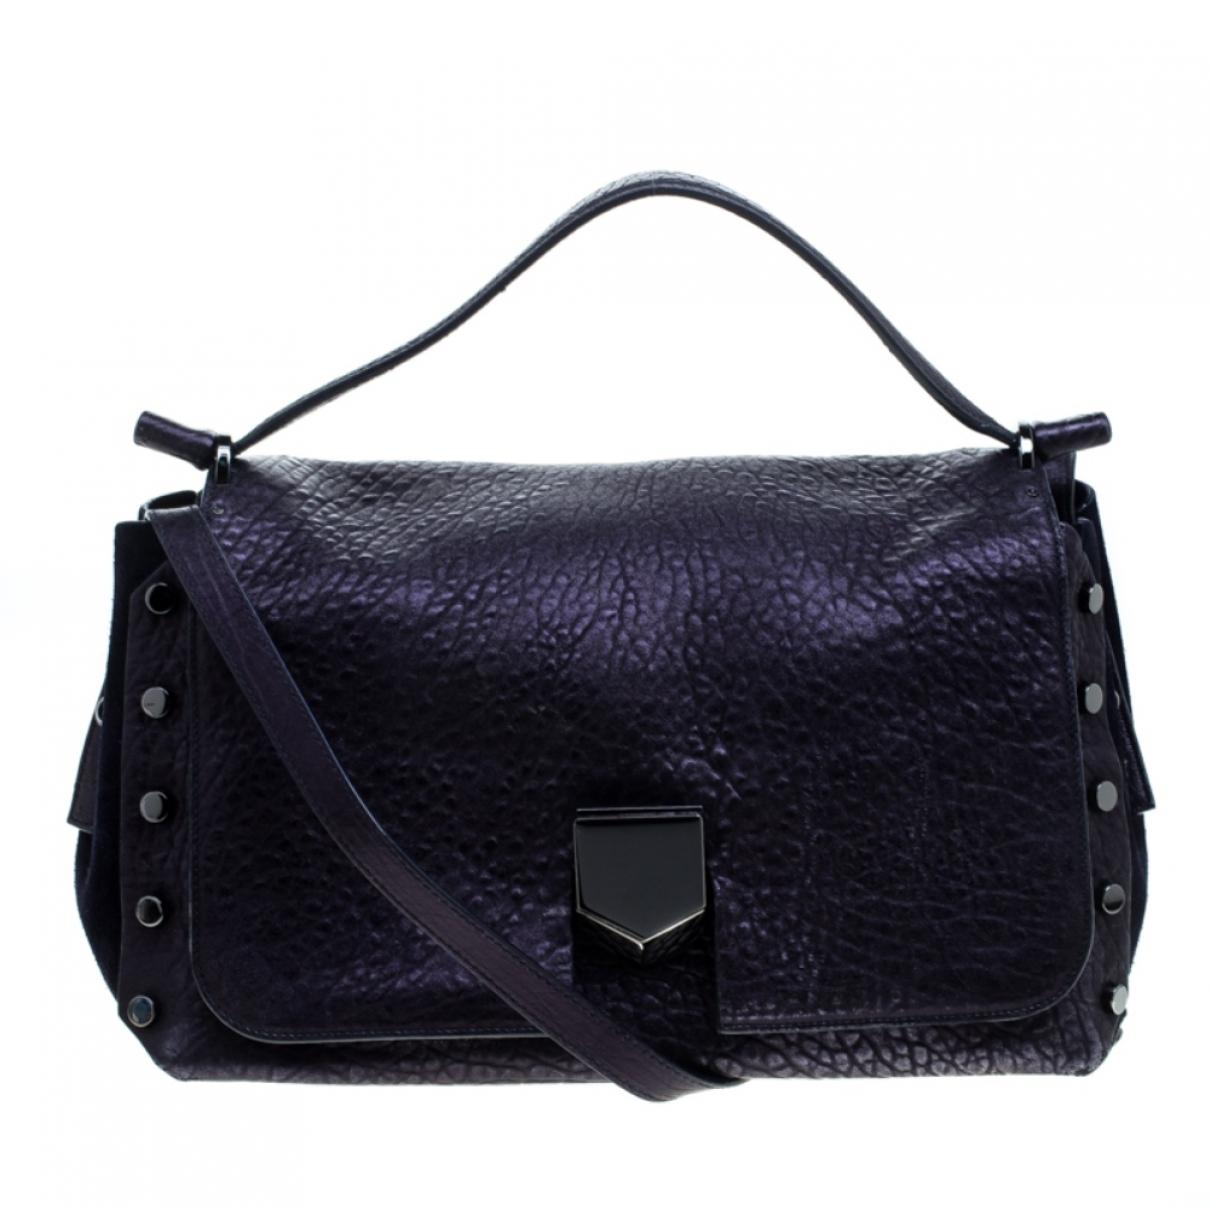 Jimmy Choo Lockett Handtasche in  Lila Leder